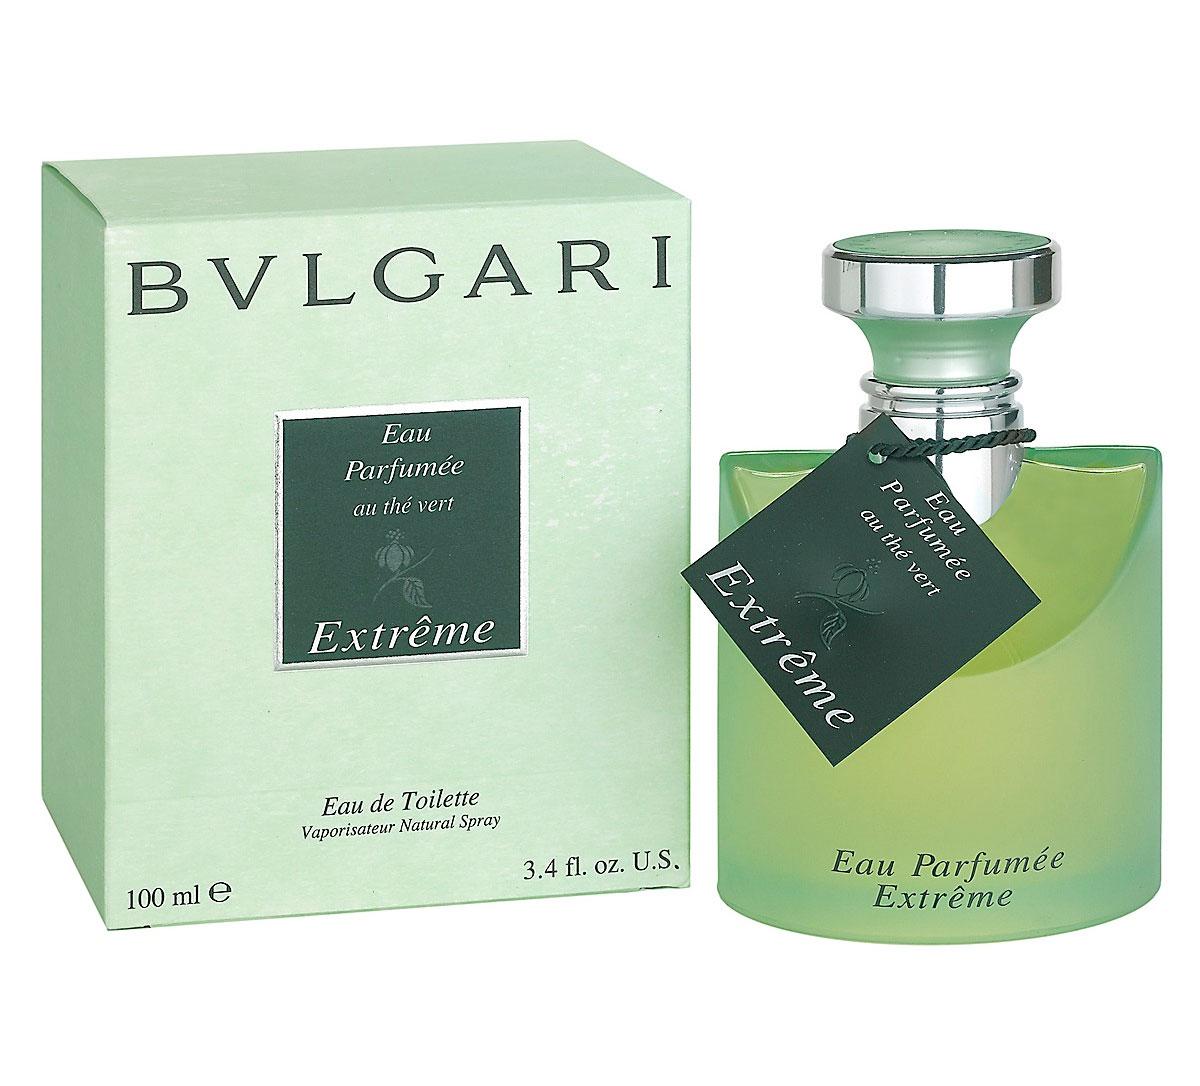 bvlgari eau parfumee au the vert extreme bvlgari perfume una fragancia para hombres y mujeres 1996. Black Bedroom Furniture Sets. Home Design Ideas